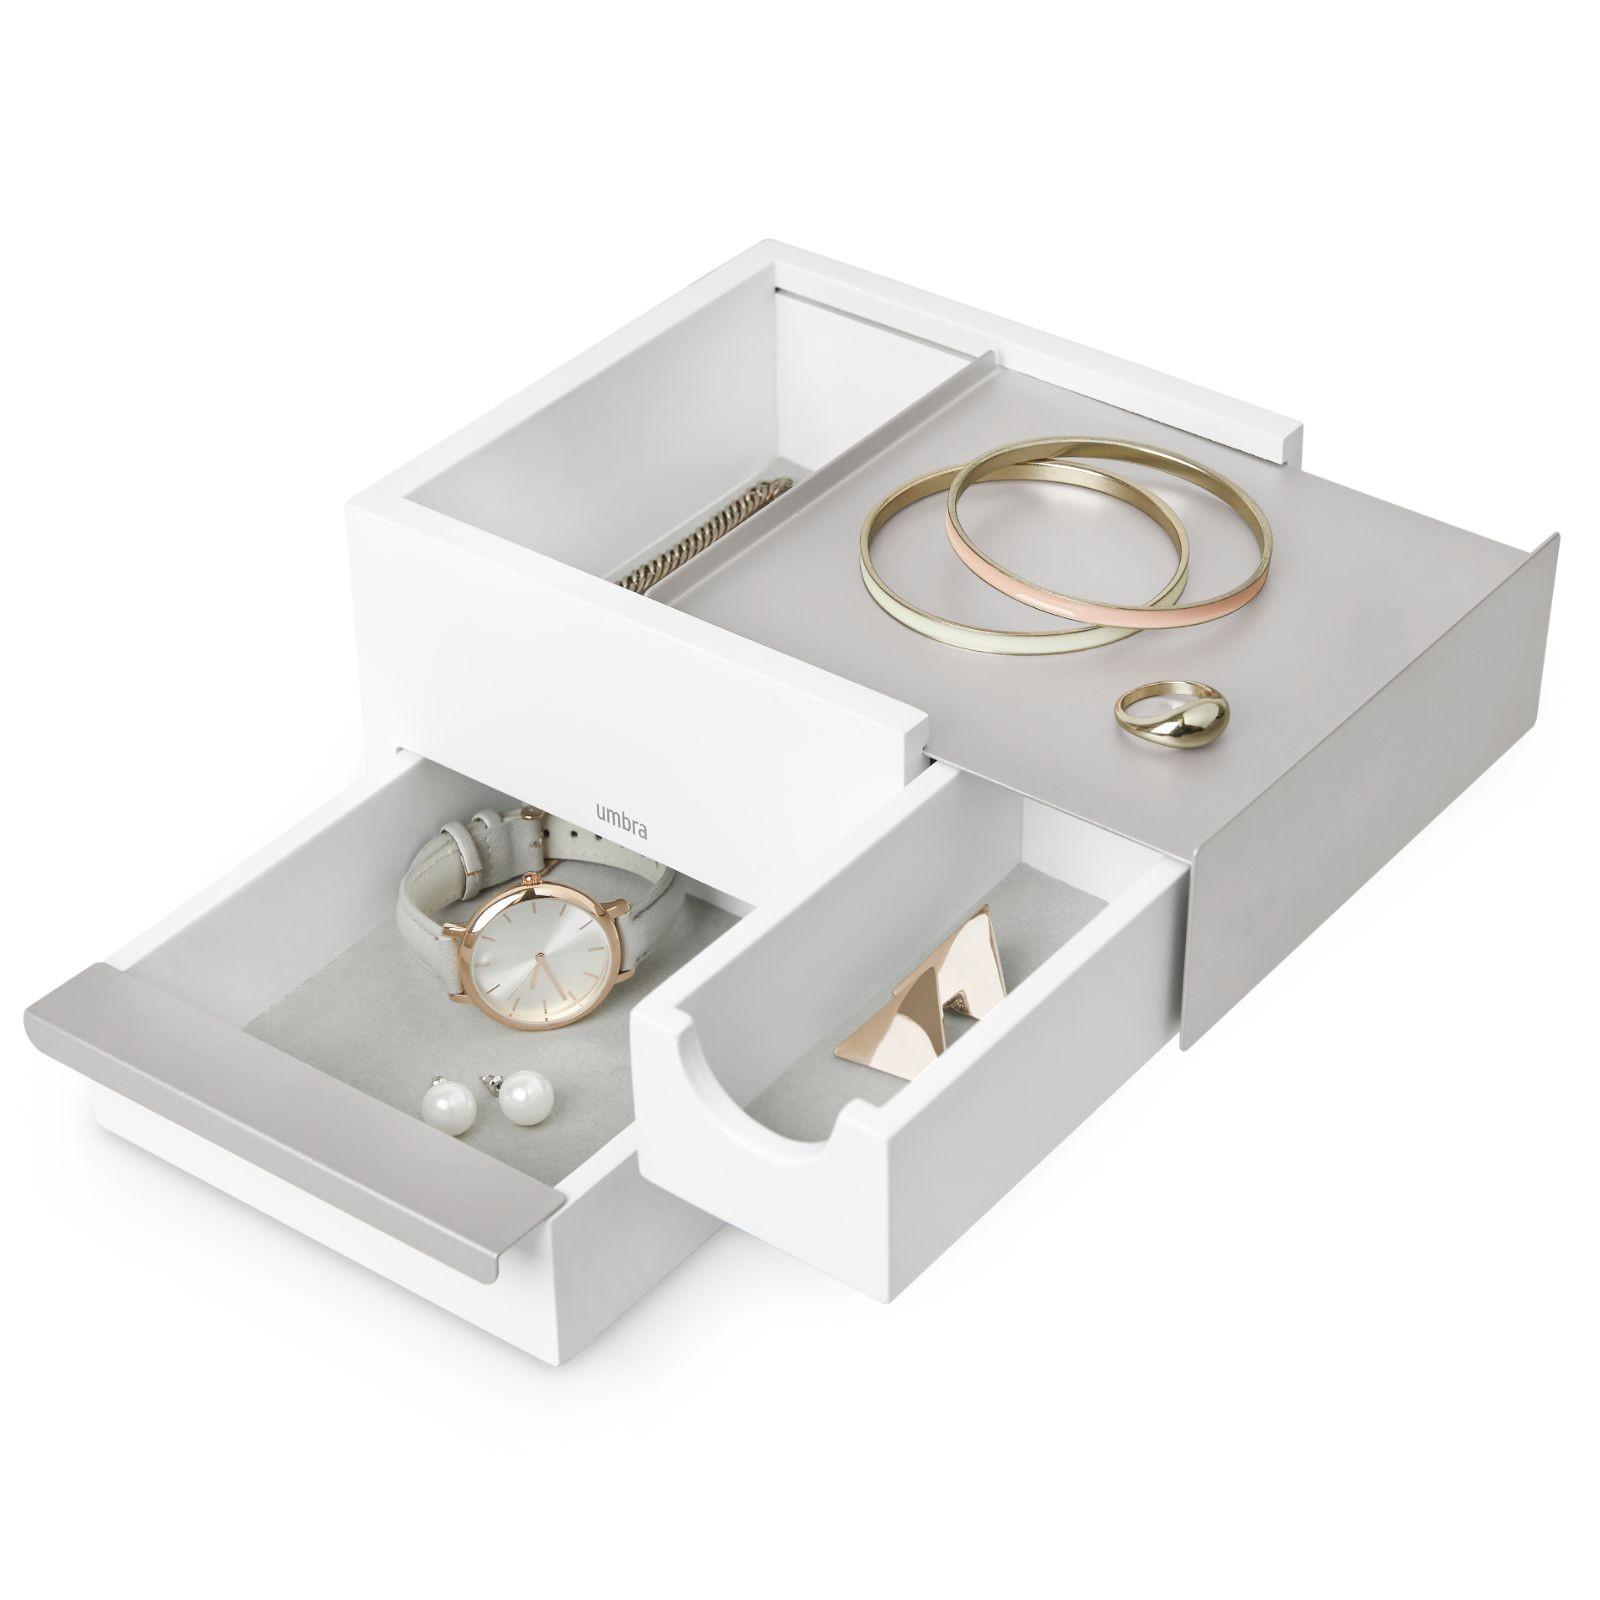 Mini Stowit Jewelry Storage Box (White / Nickel) - Umbra